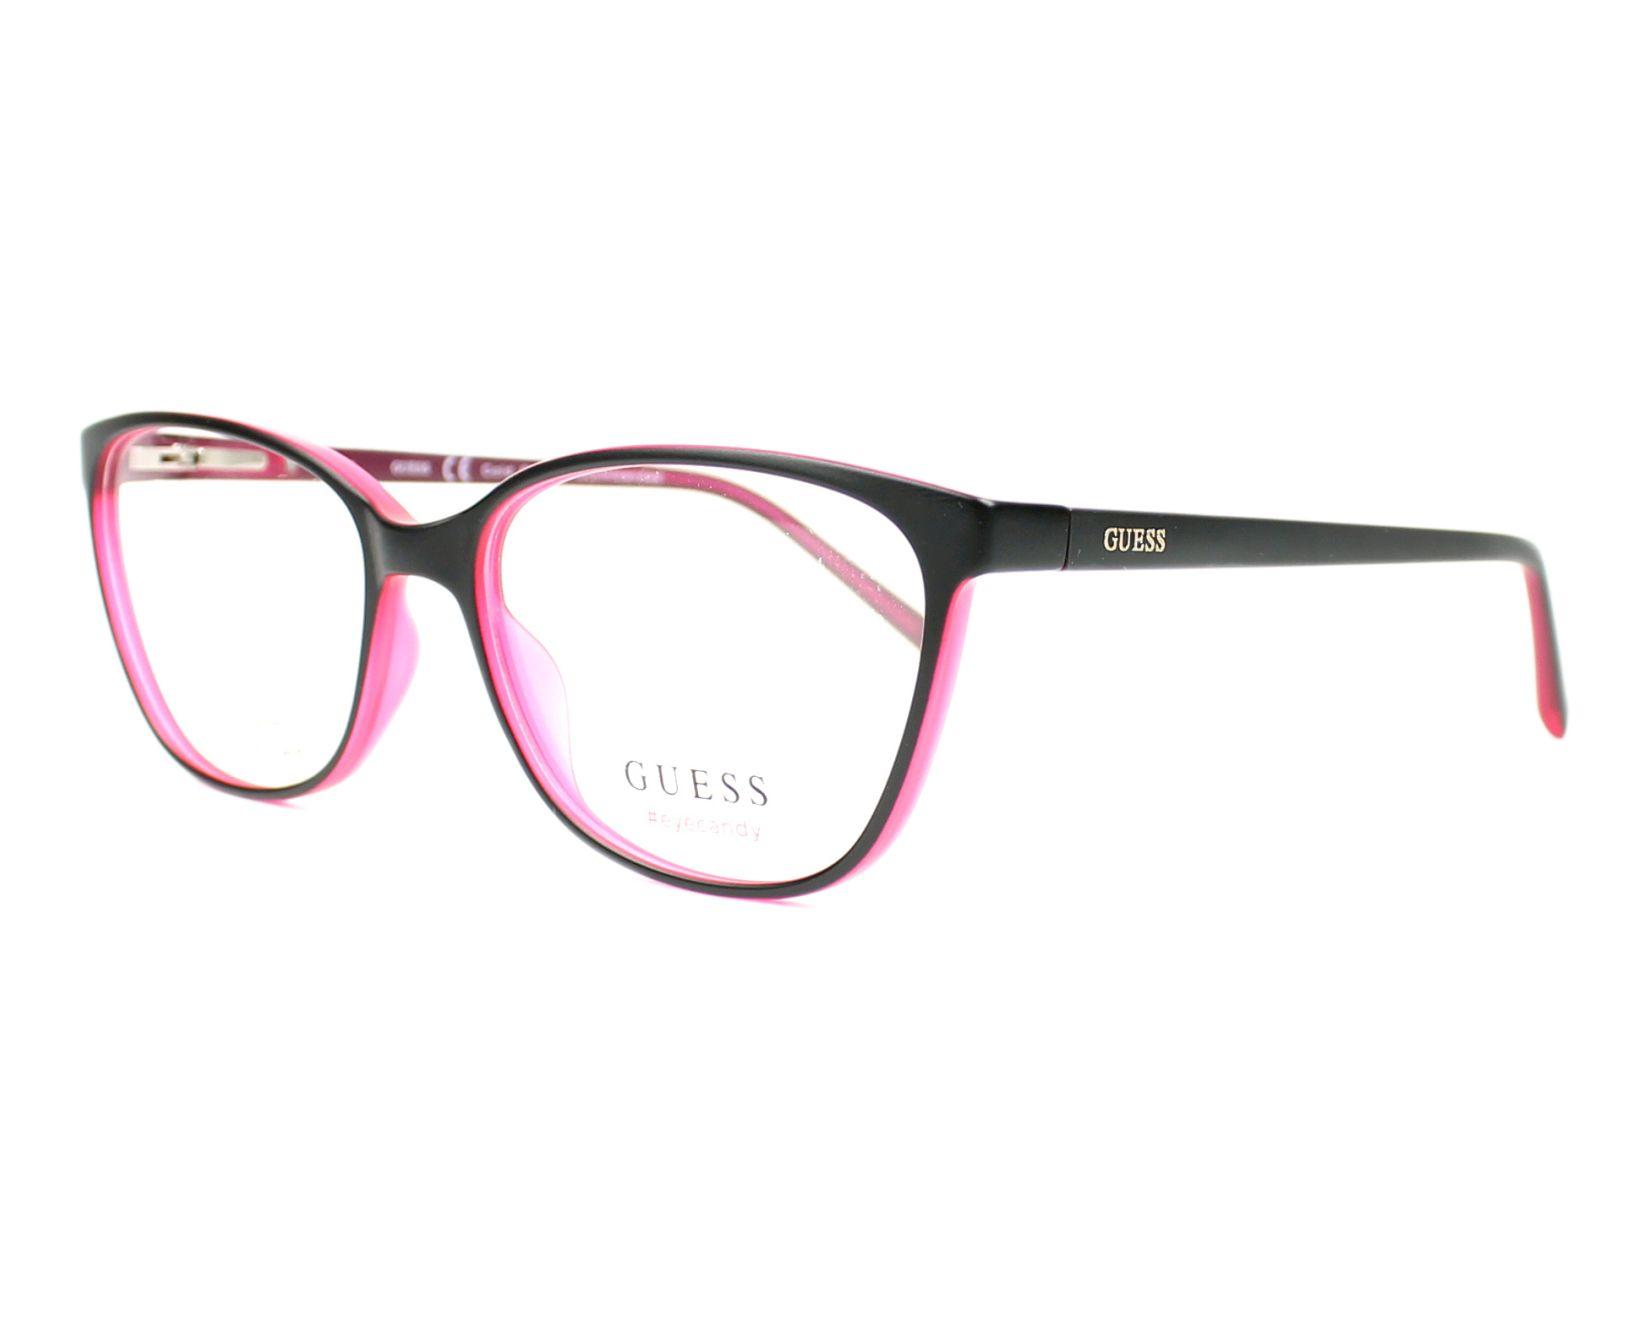 Guess Eyeglasses Black GU-3008 002 - Visionet US